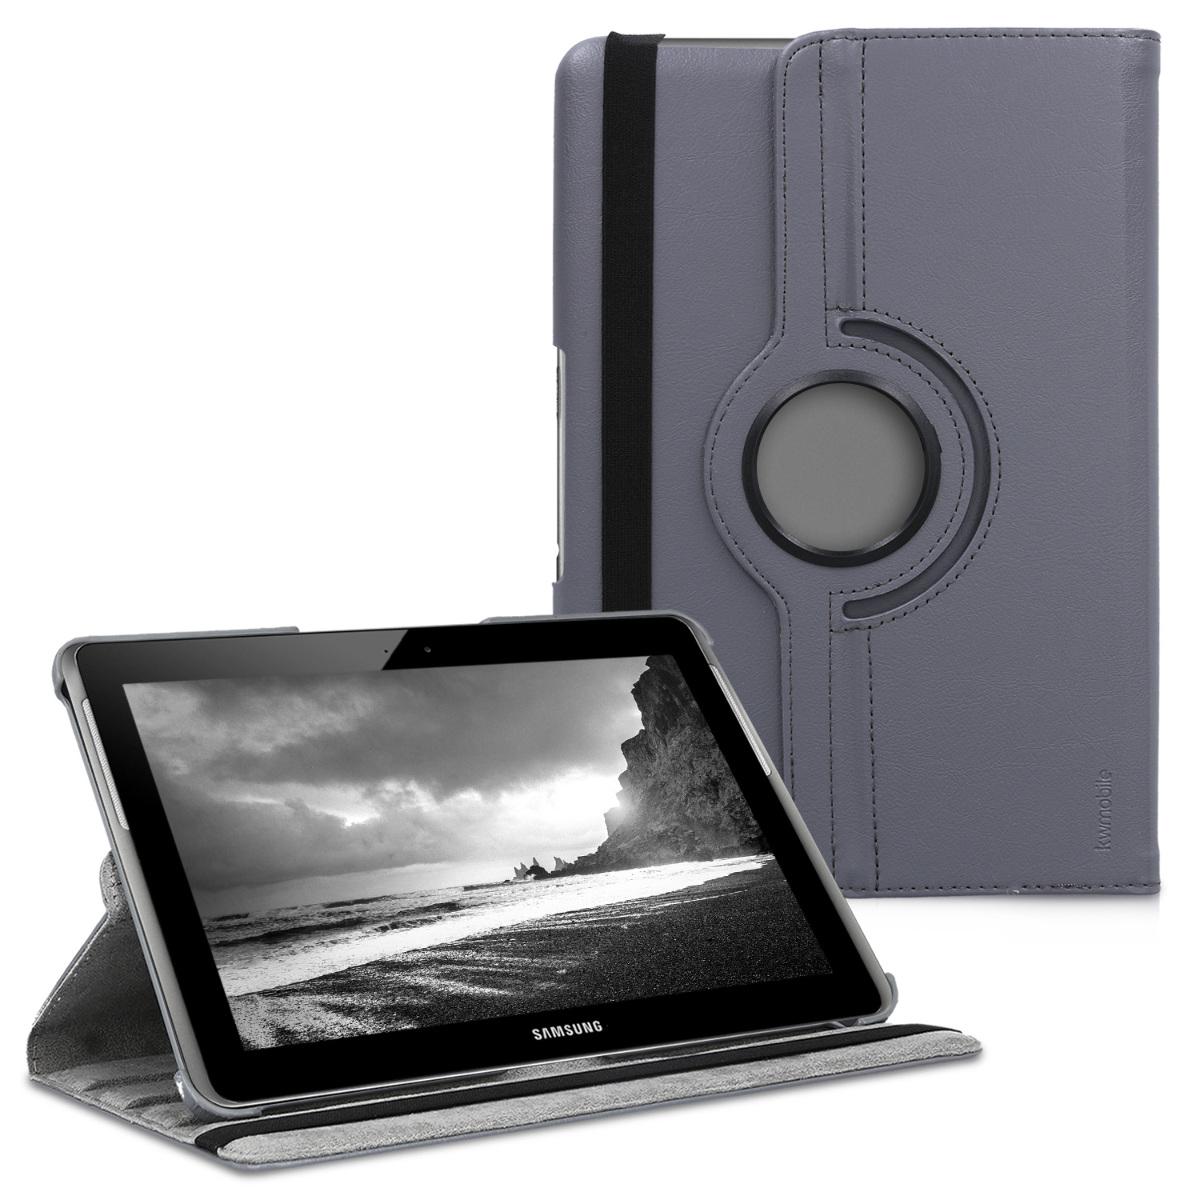 KW Θήκη 360° Samsung Galaxy Tab 2 10.1 P5100/P5110 - Συνθετικό Δέρμα - Anthracite (11211.73)